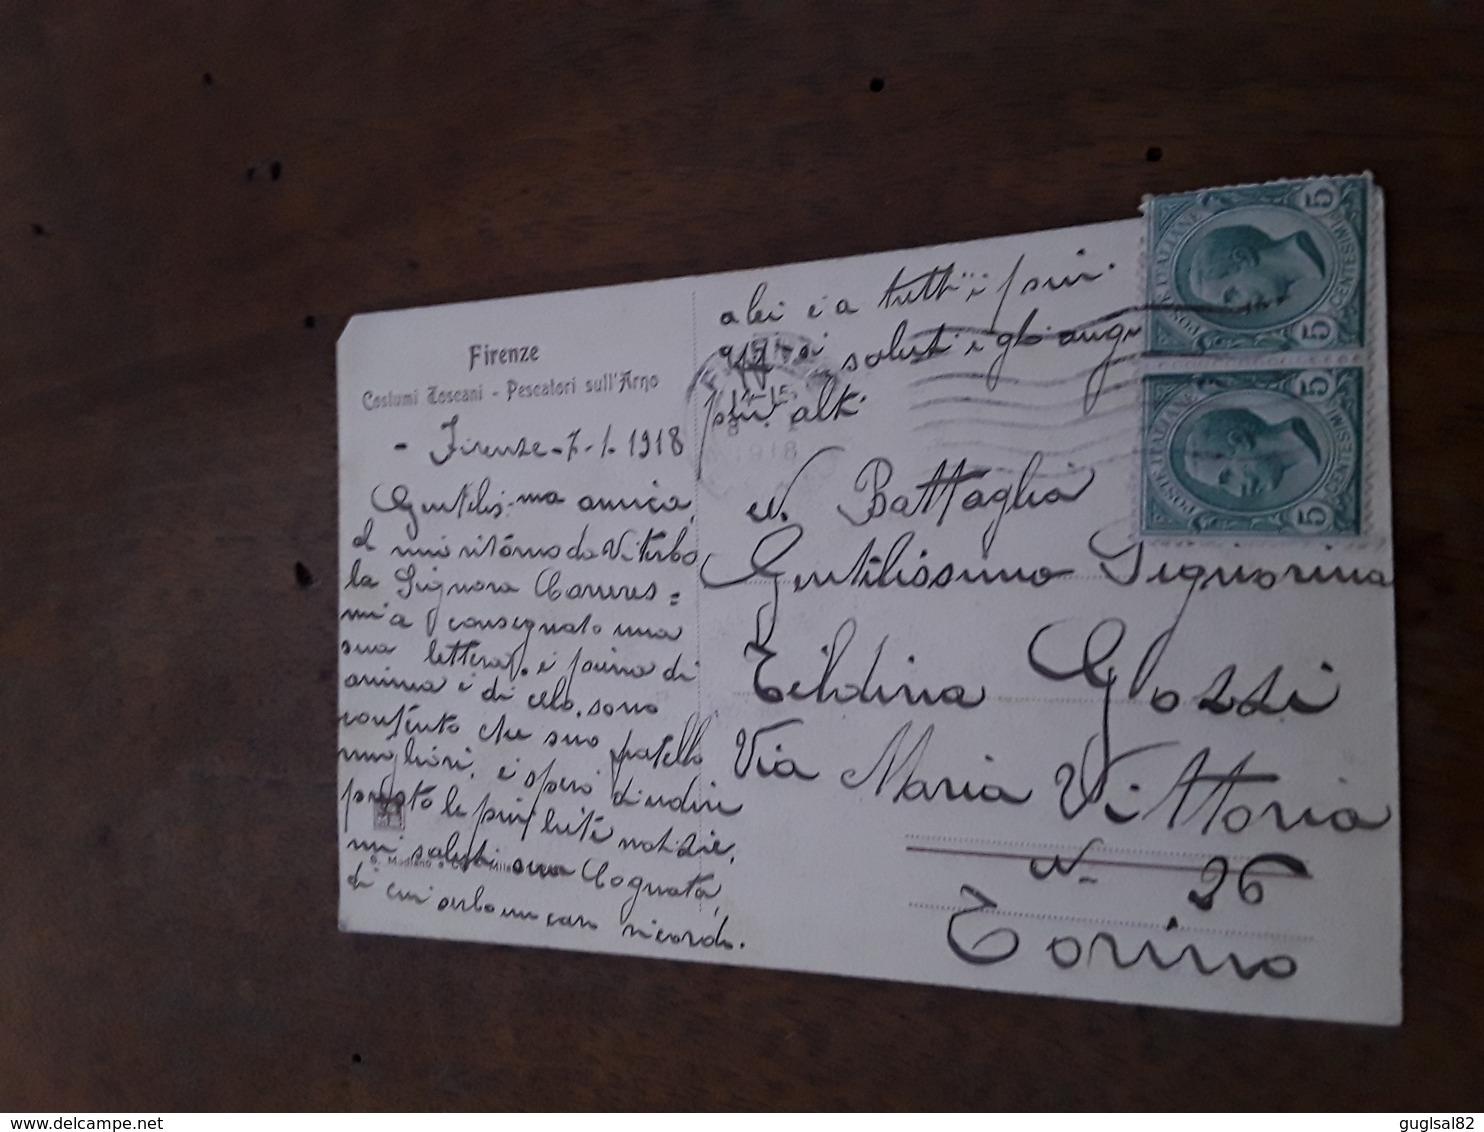 Cartolina Postale 1918, Firenze, Pescatori Sull'Arno - Firenze (Florence)